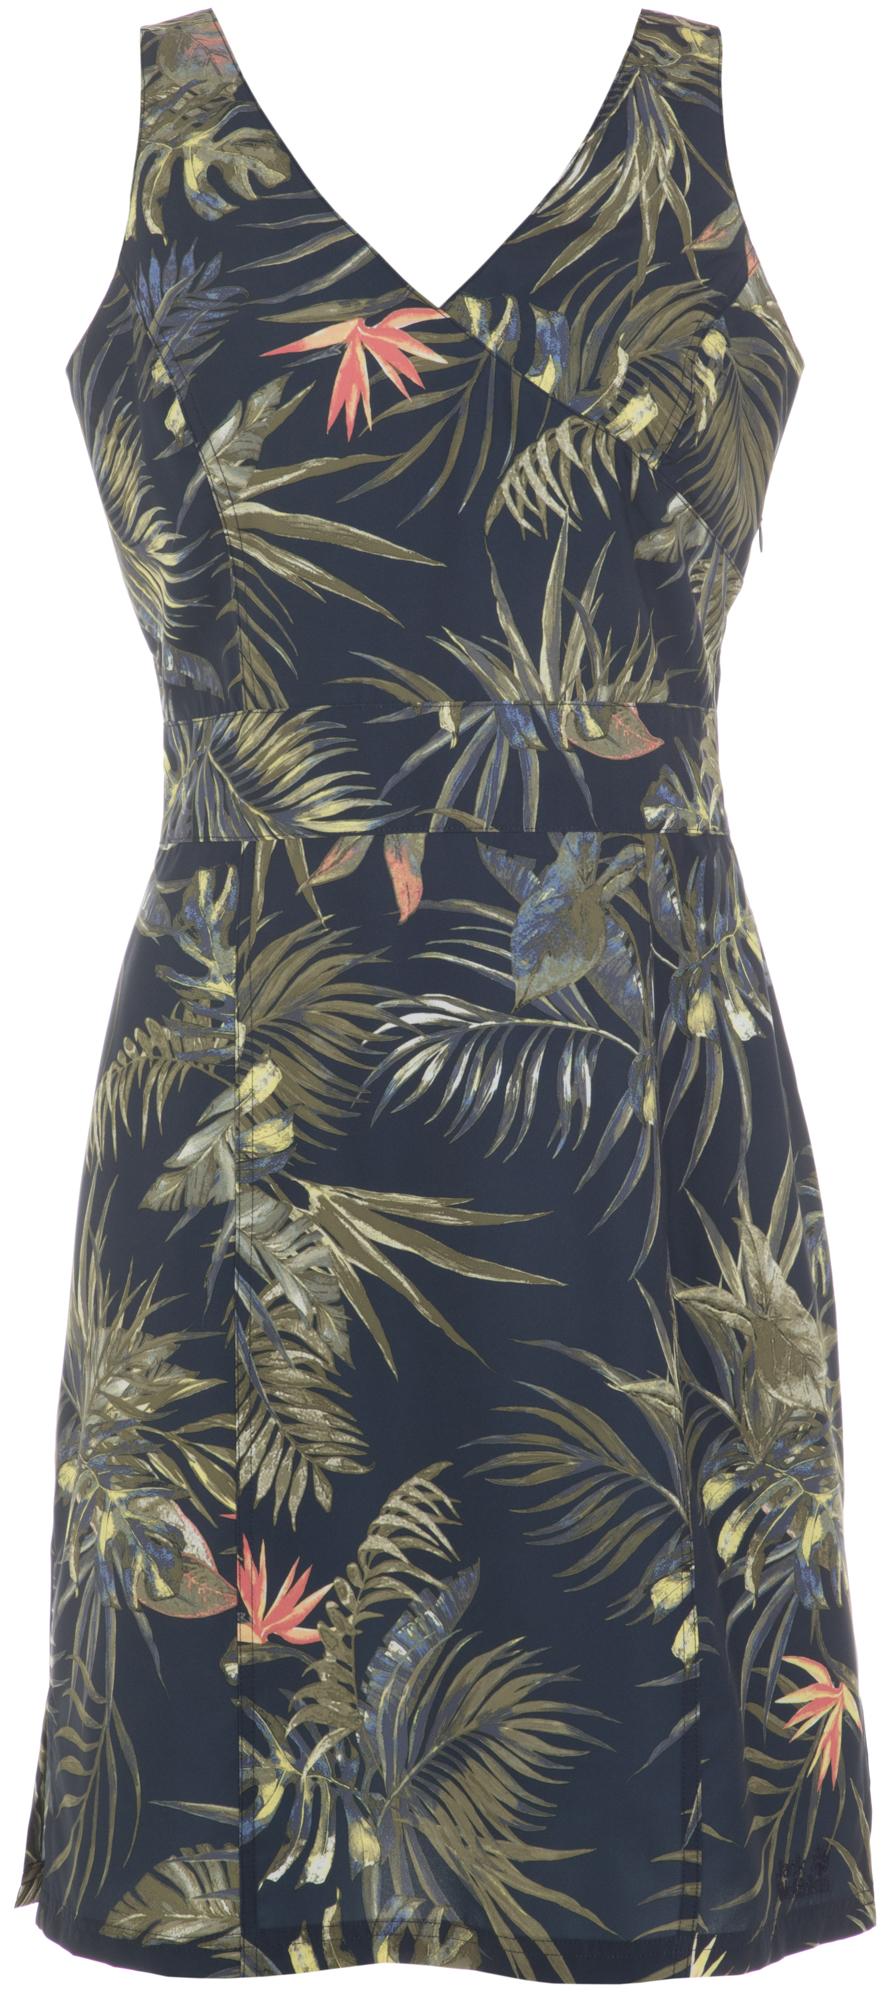 Фото - JACK WOLFSKIN Платье женское Jack Wolfskin Wahia Tropical, размер 46-48 tropical flower plus size bikini set